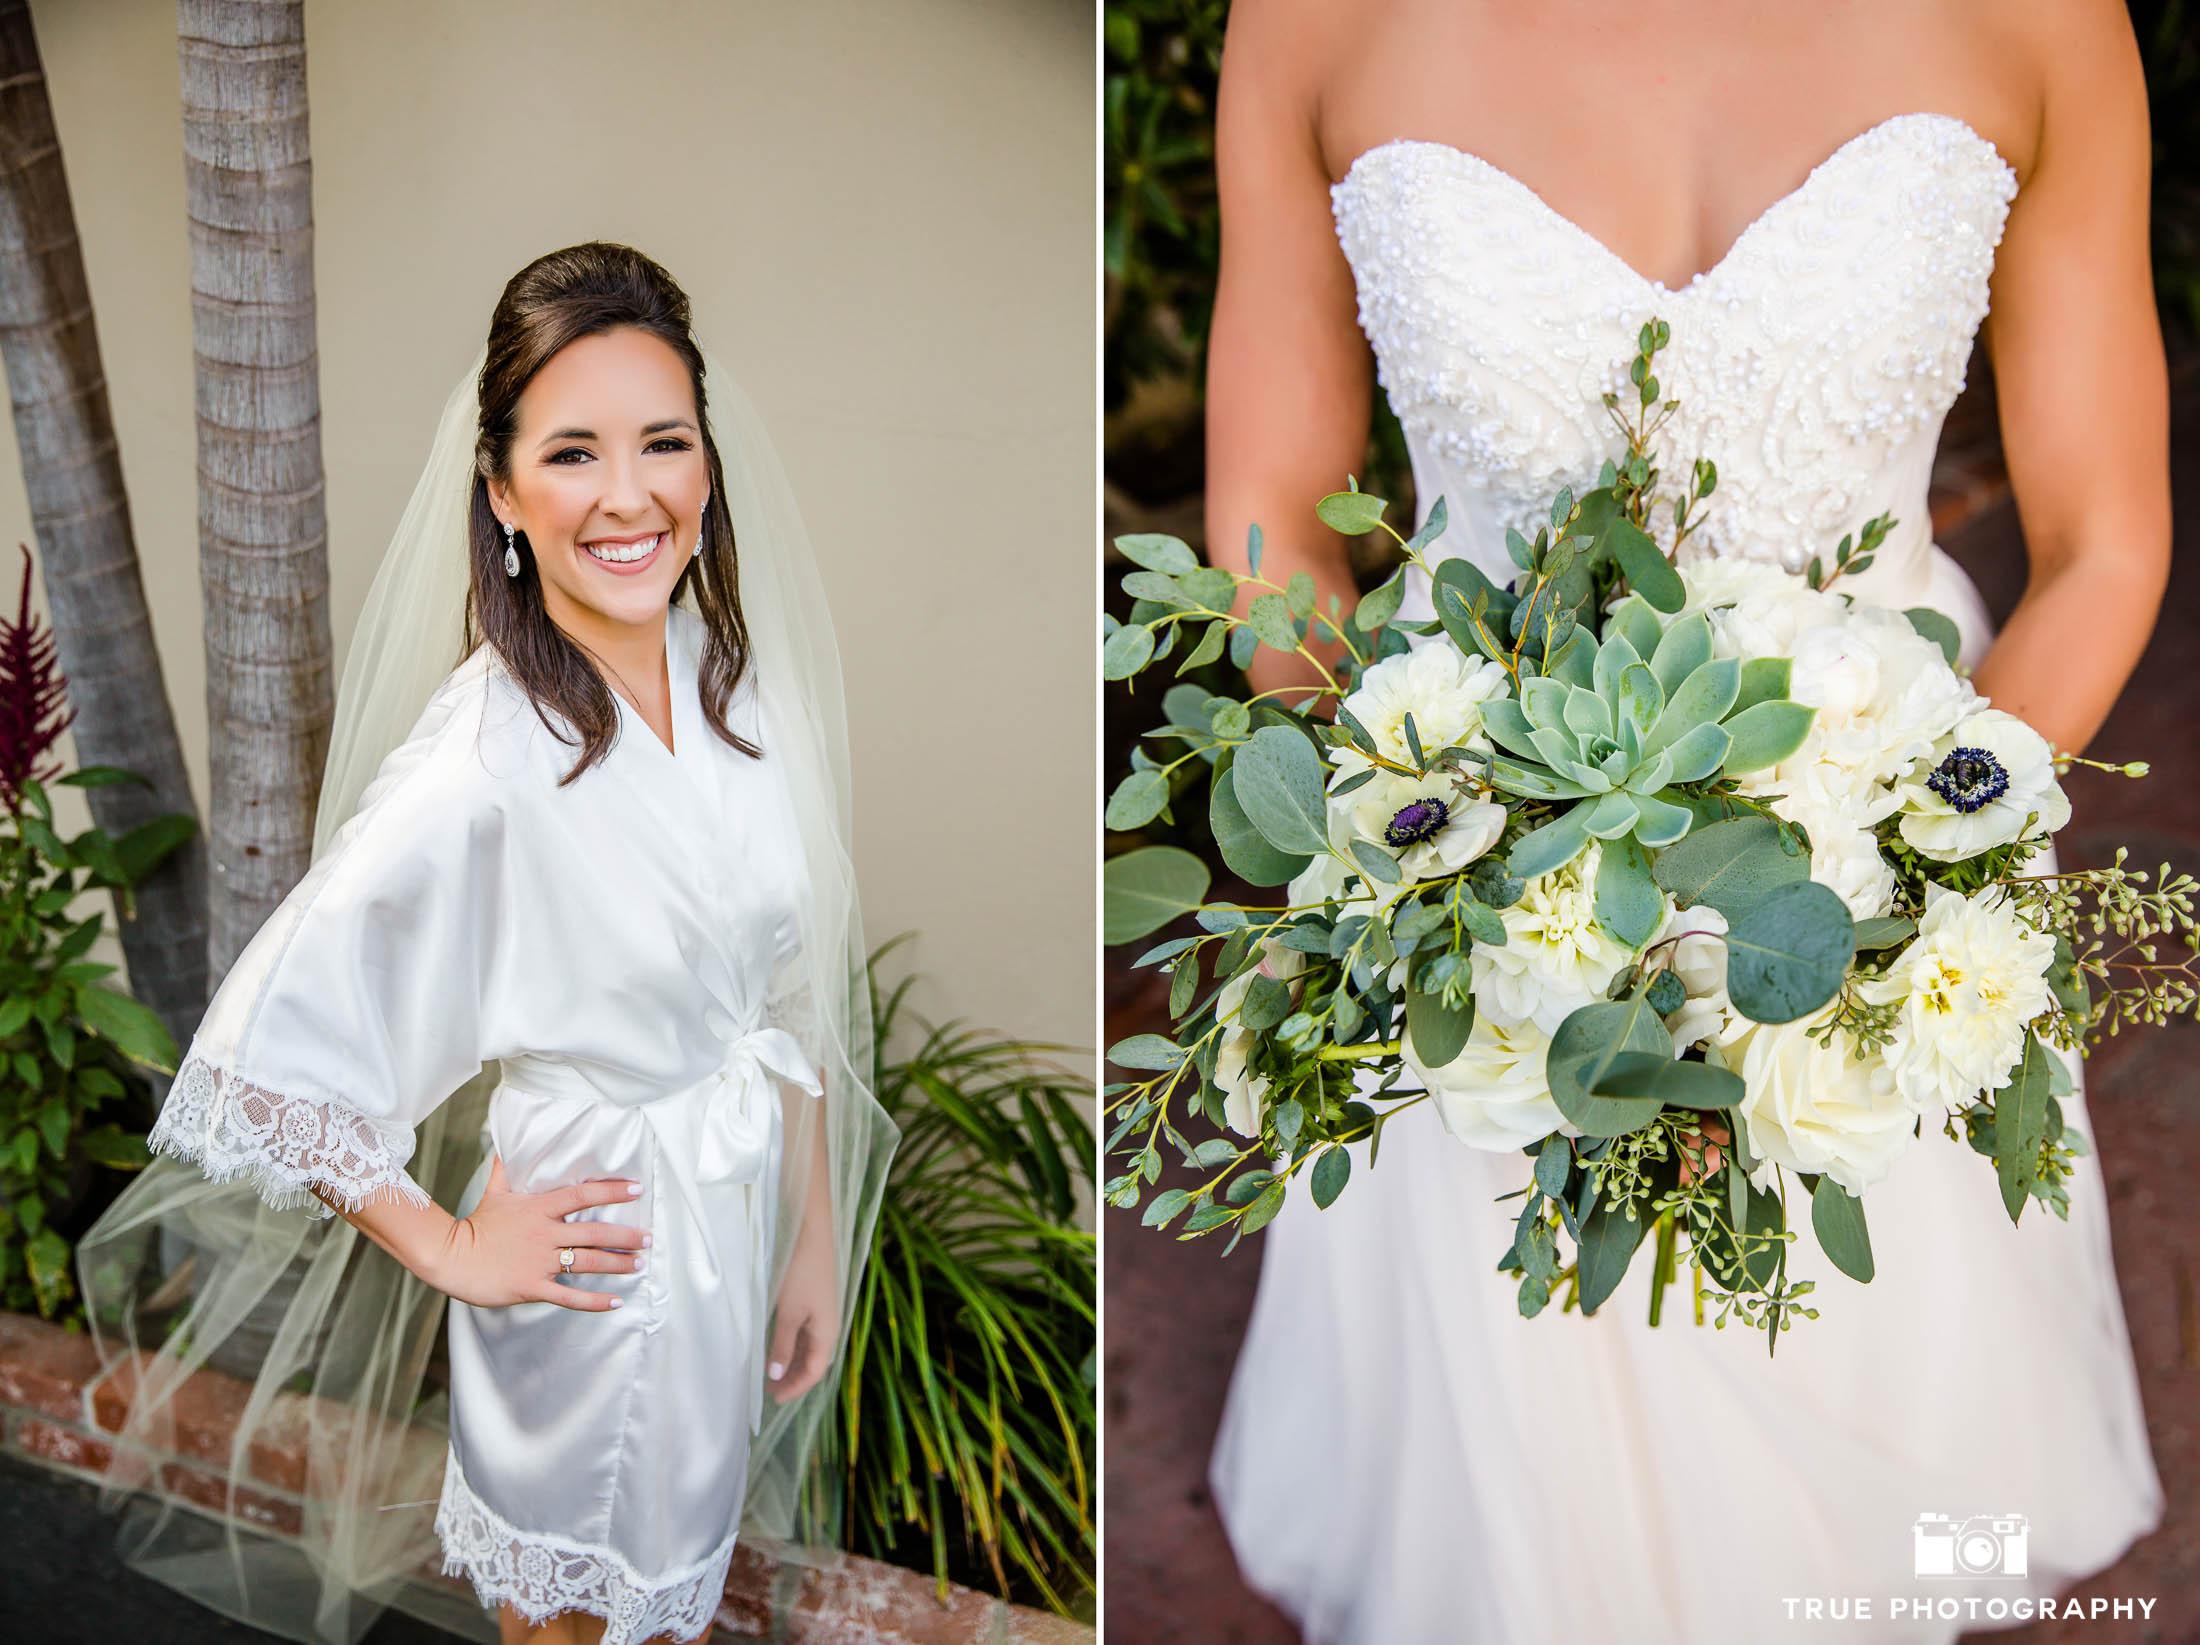 Bride smiles with bouquet